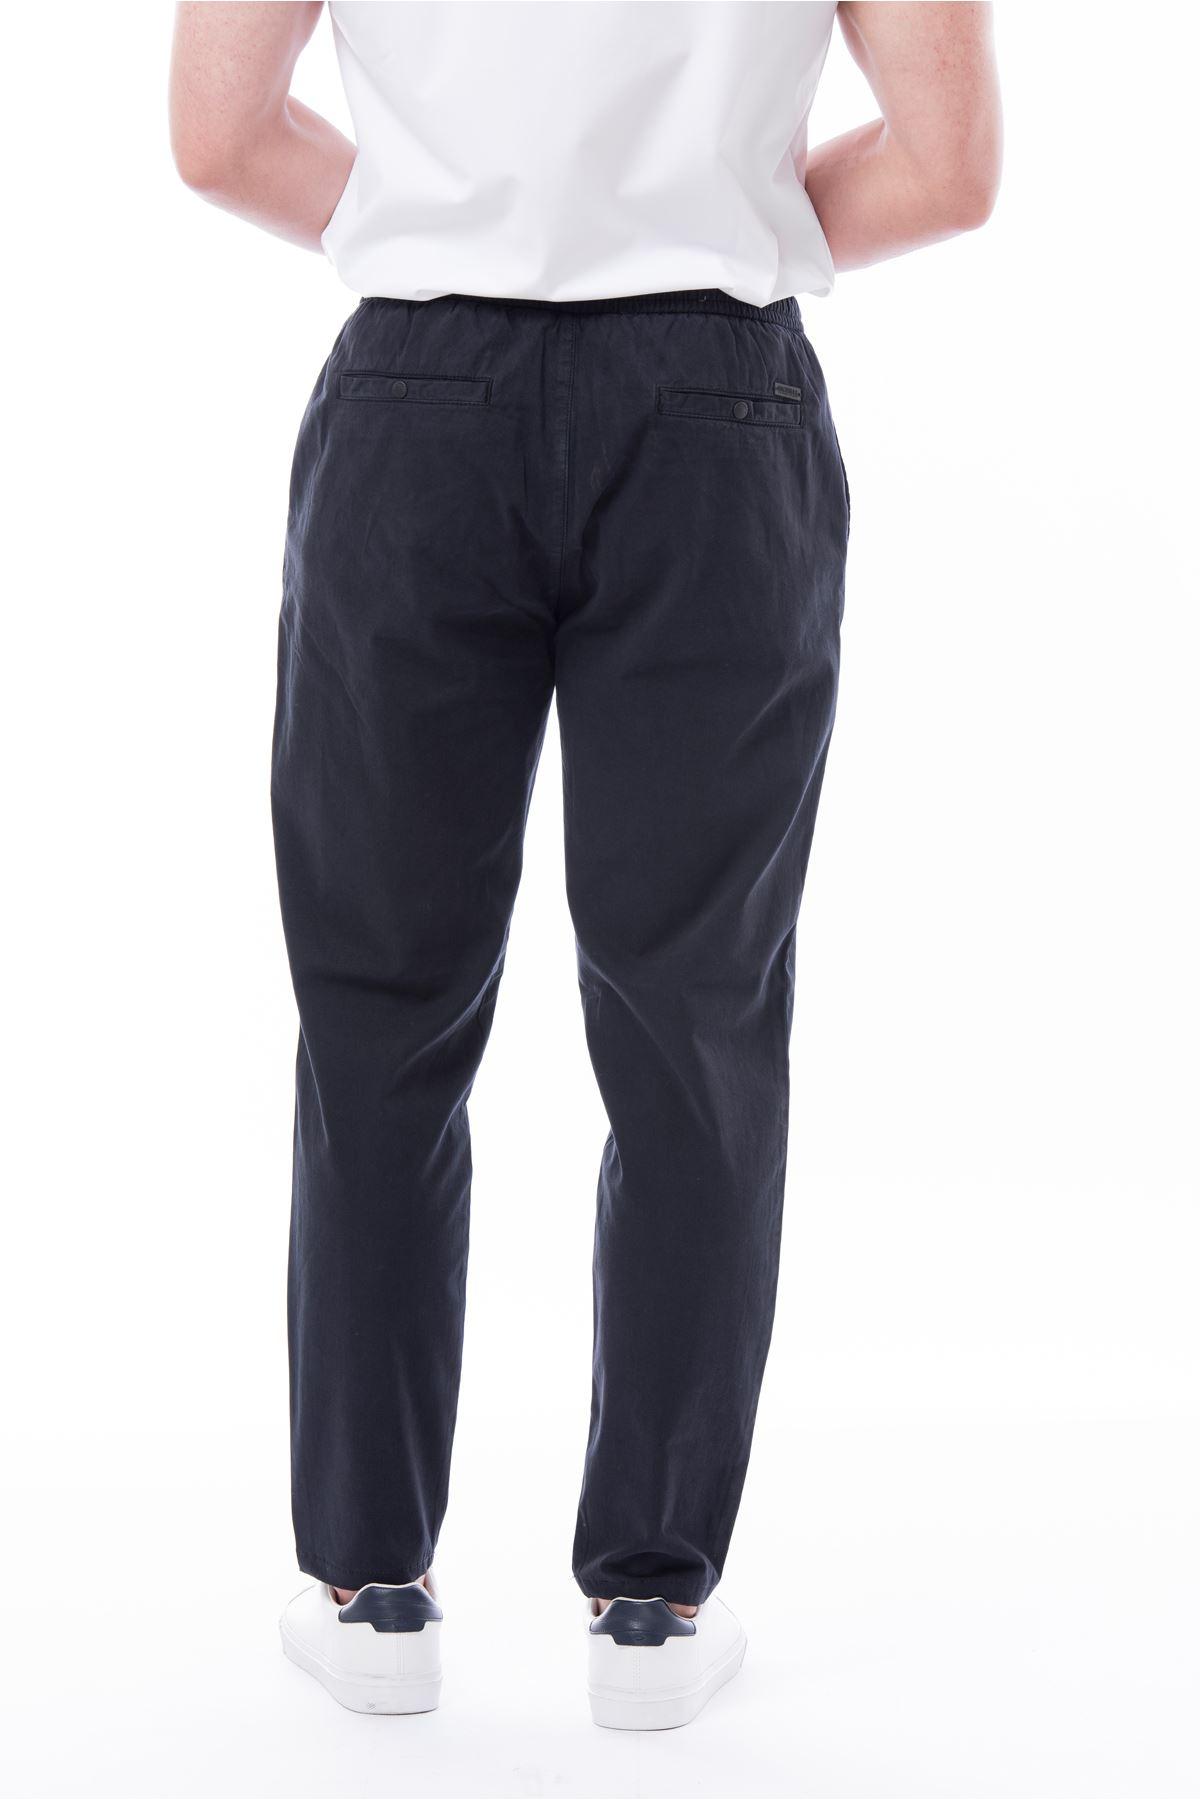 Lacivert Beli Lastikli Bağcıklı Jogger Pantolon